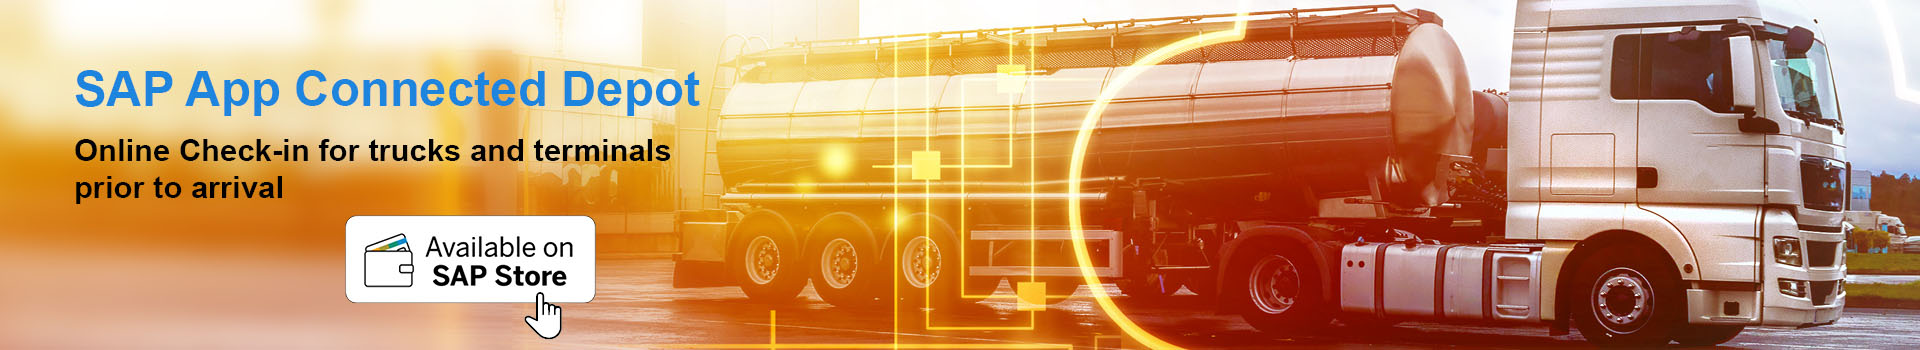 Implico SAP APP Connected Depot